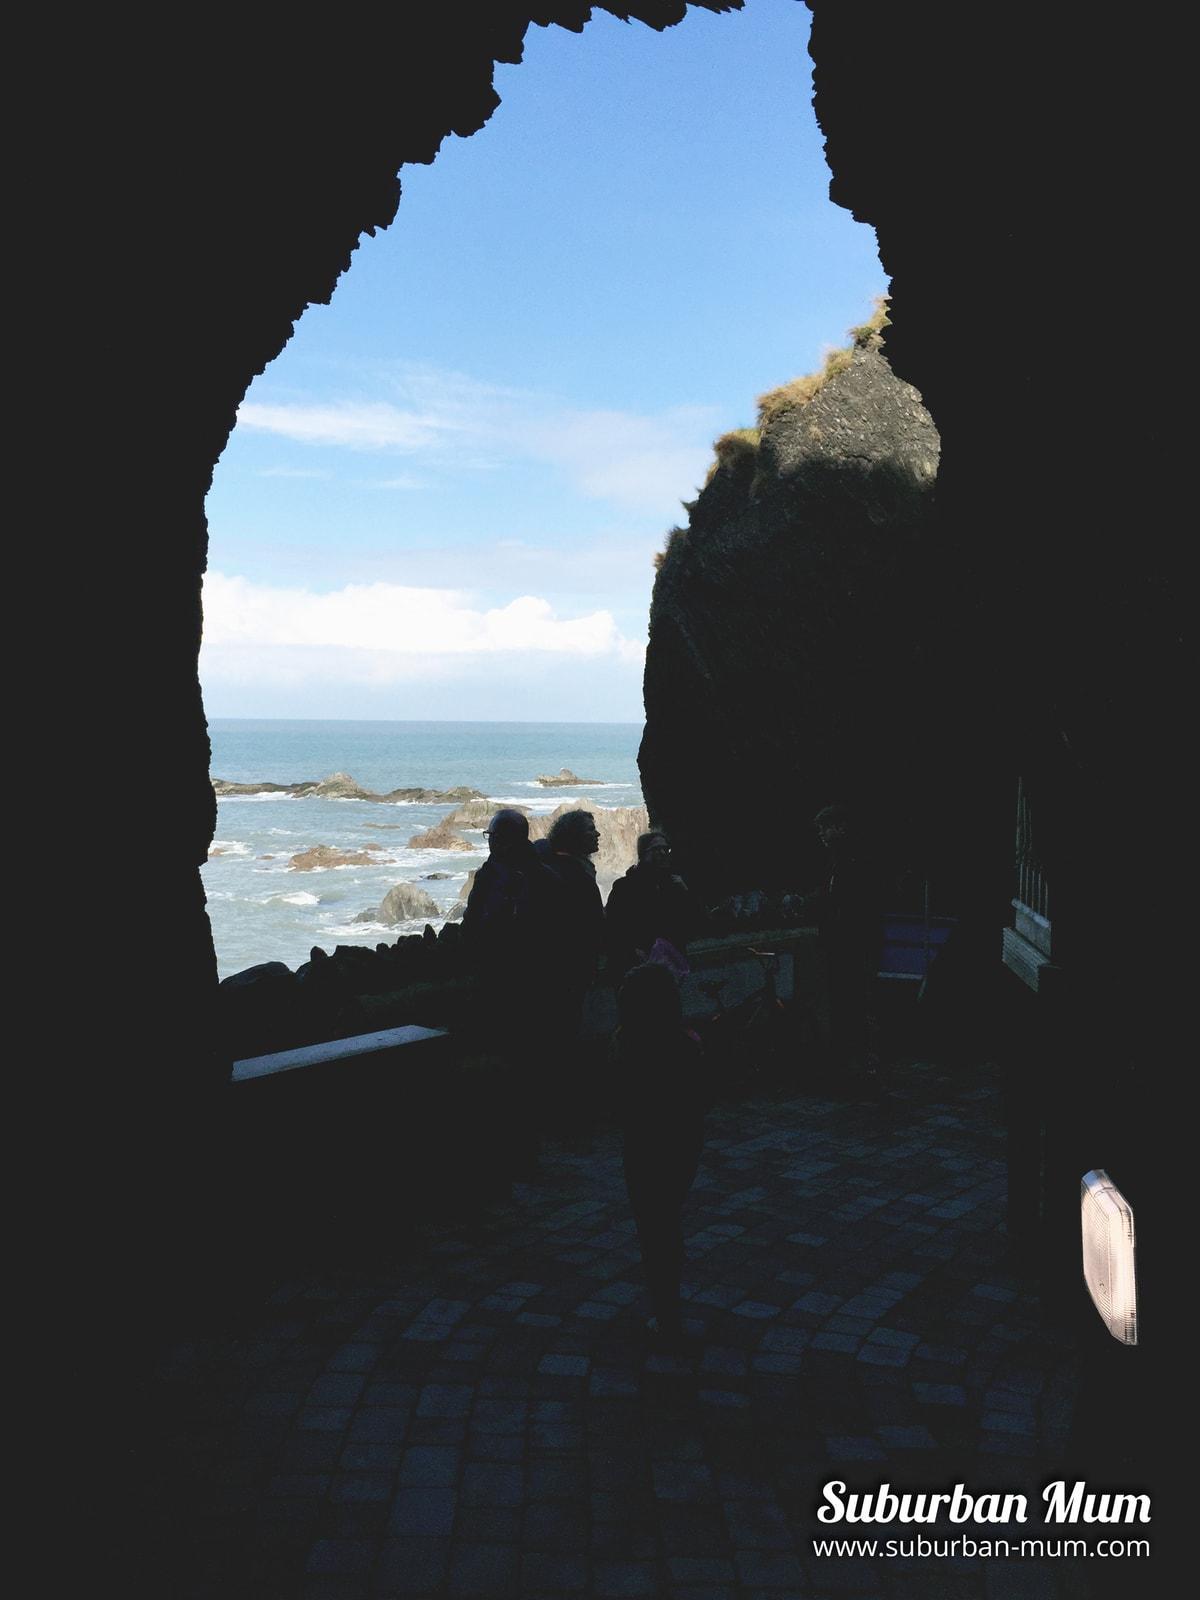 Tunnels Beaches - Ilfracombe